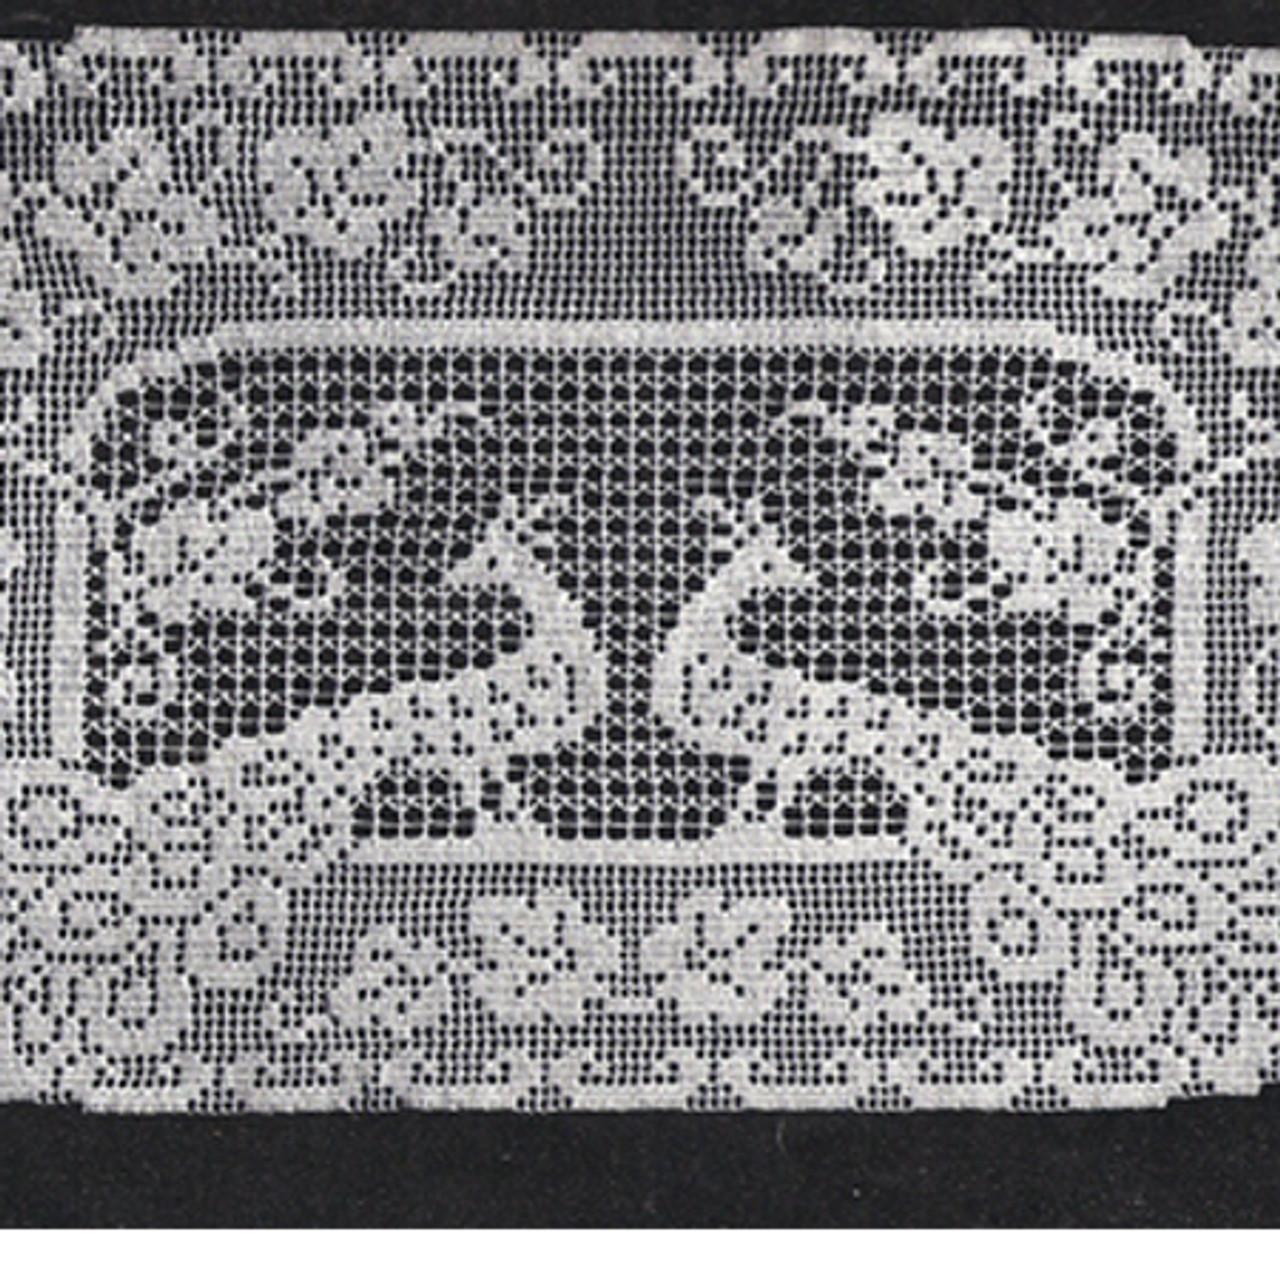 Lily Mills Peacock Runner Pattern in Filet Crochet